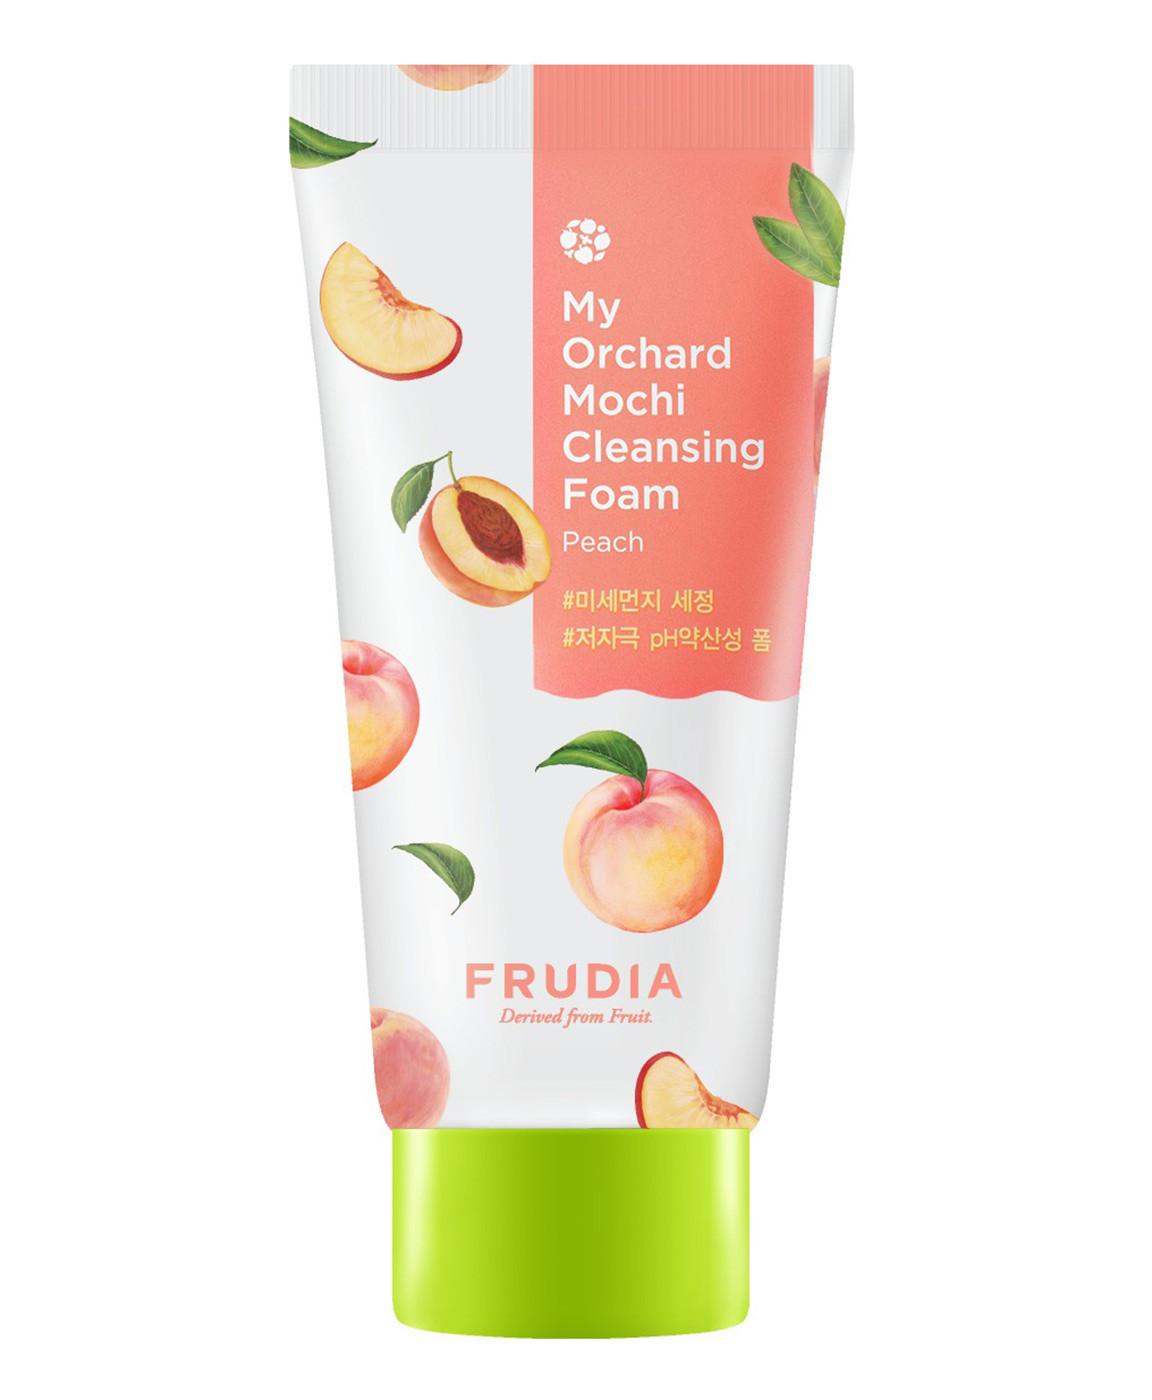 Миниатюра пенки c персиком Frudia My Orchard Peach Mochi Cleansing Foam - 31 гр